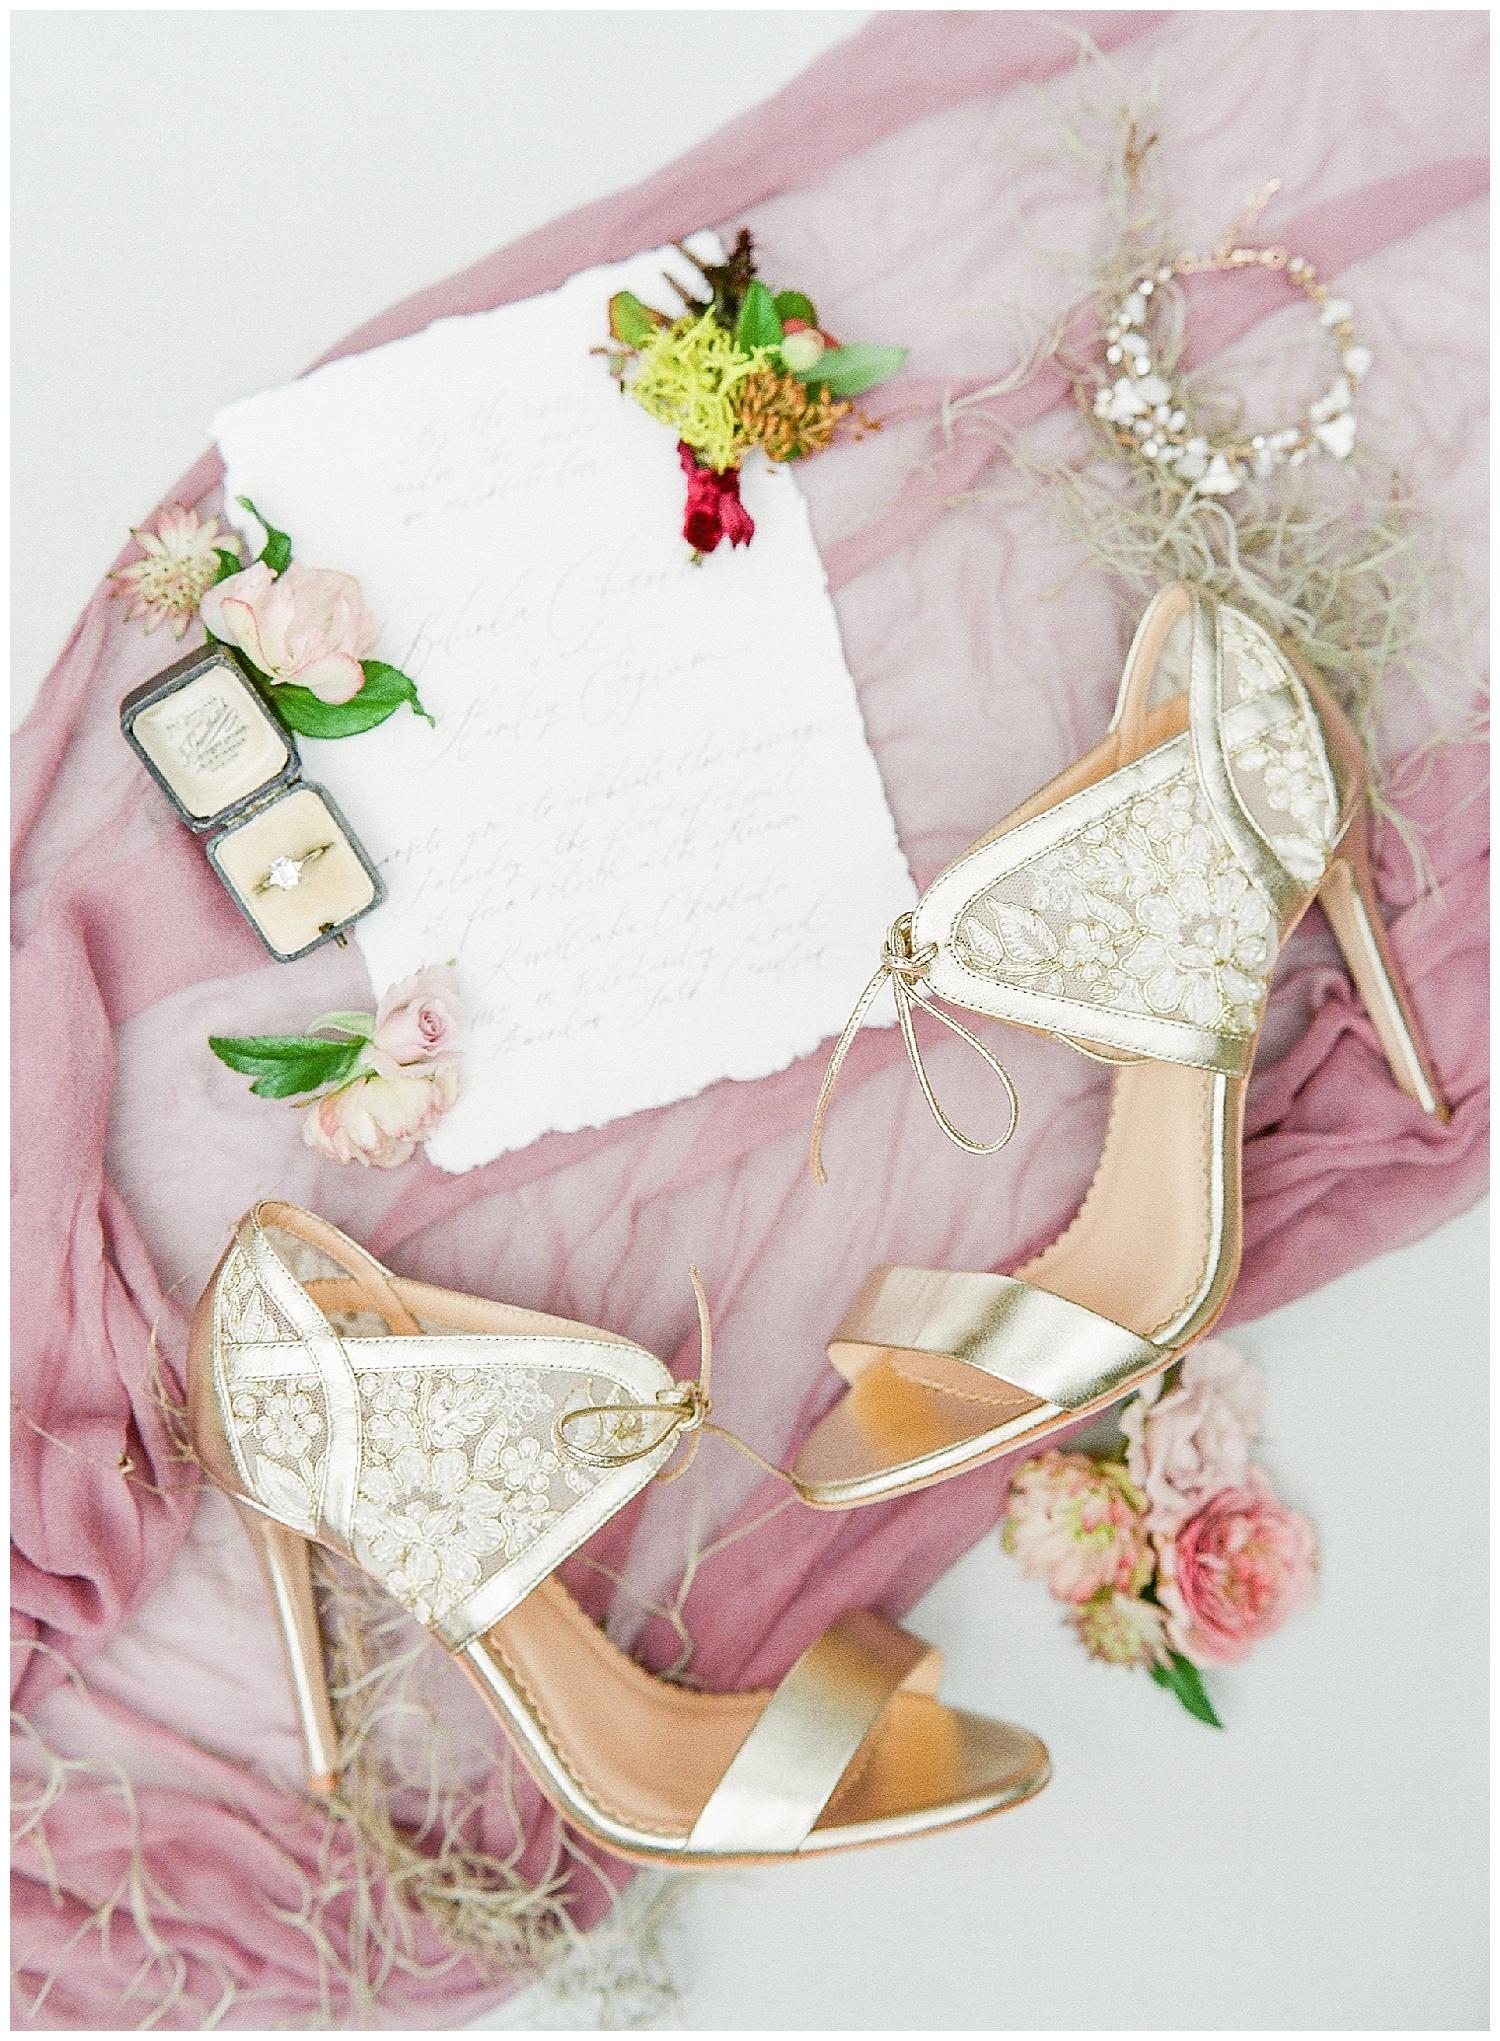 Charleston_Wedding_Janine_Licare_Photography_East_Made_Event_Company_0019_2.jpg